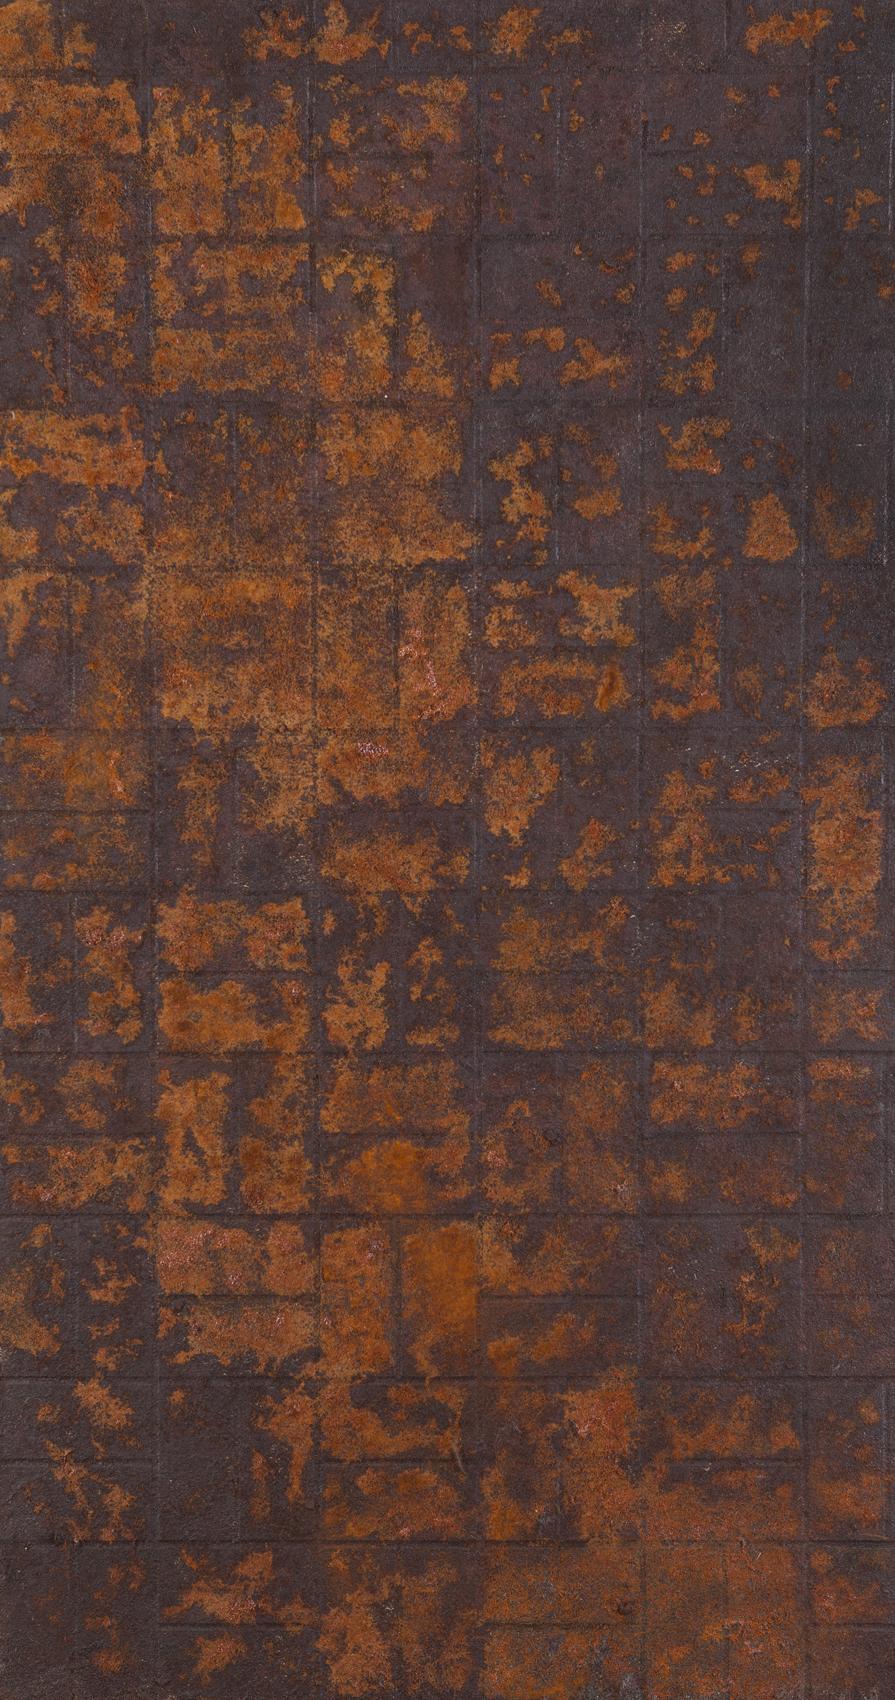 Untitled, 2016, Steel wool and rust on plywood, 150x80 cm (3).jpg